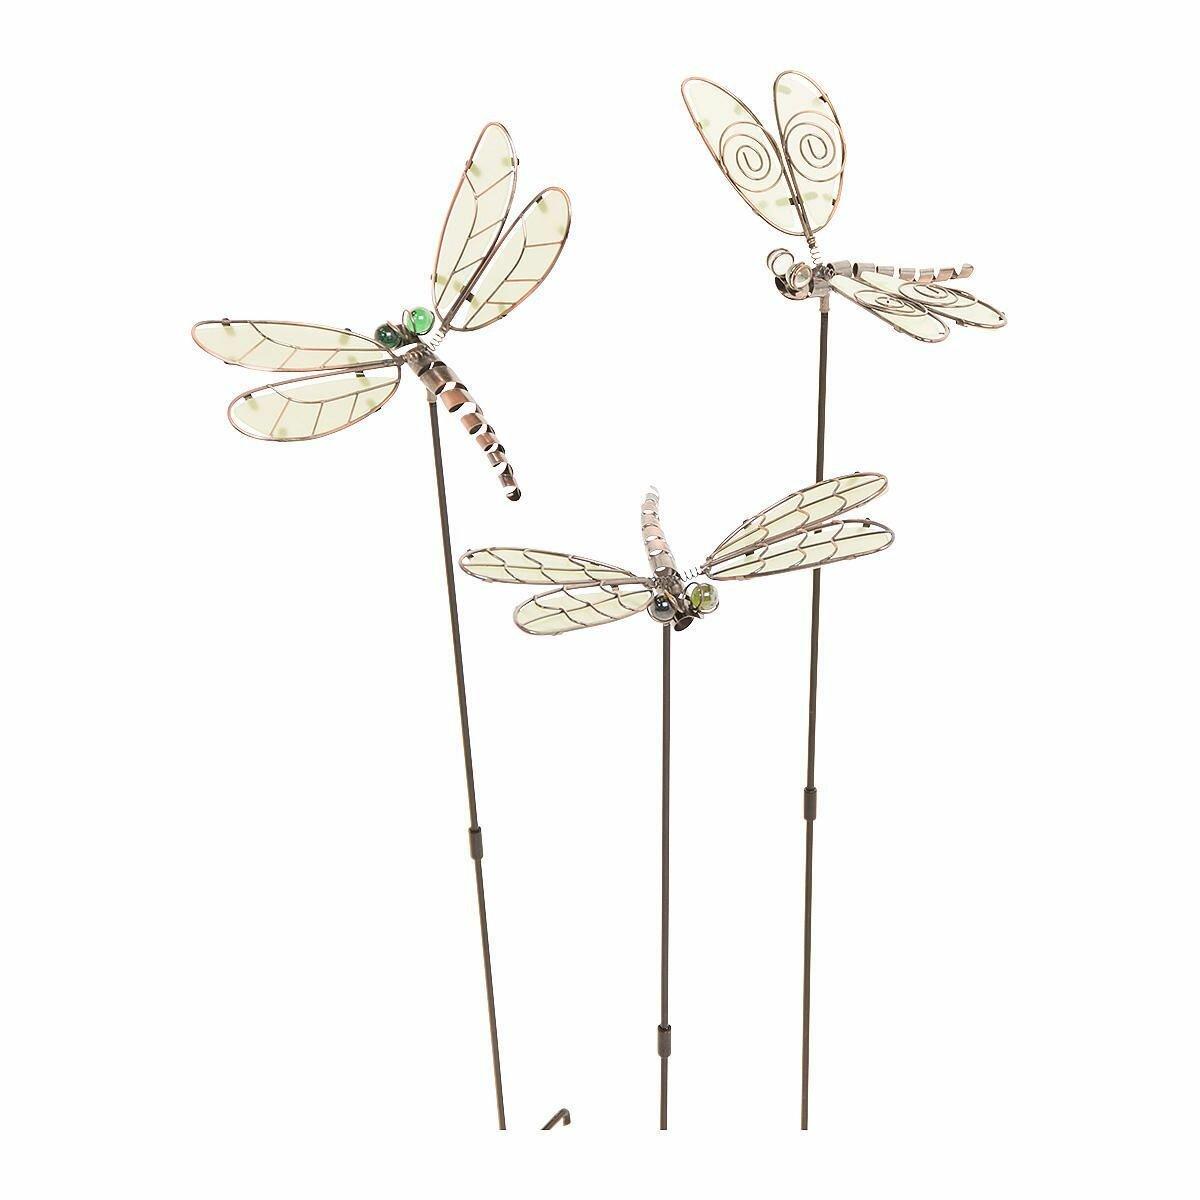 Pureday 3 Piece Dragonfly Garden Stake